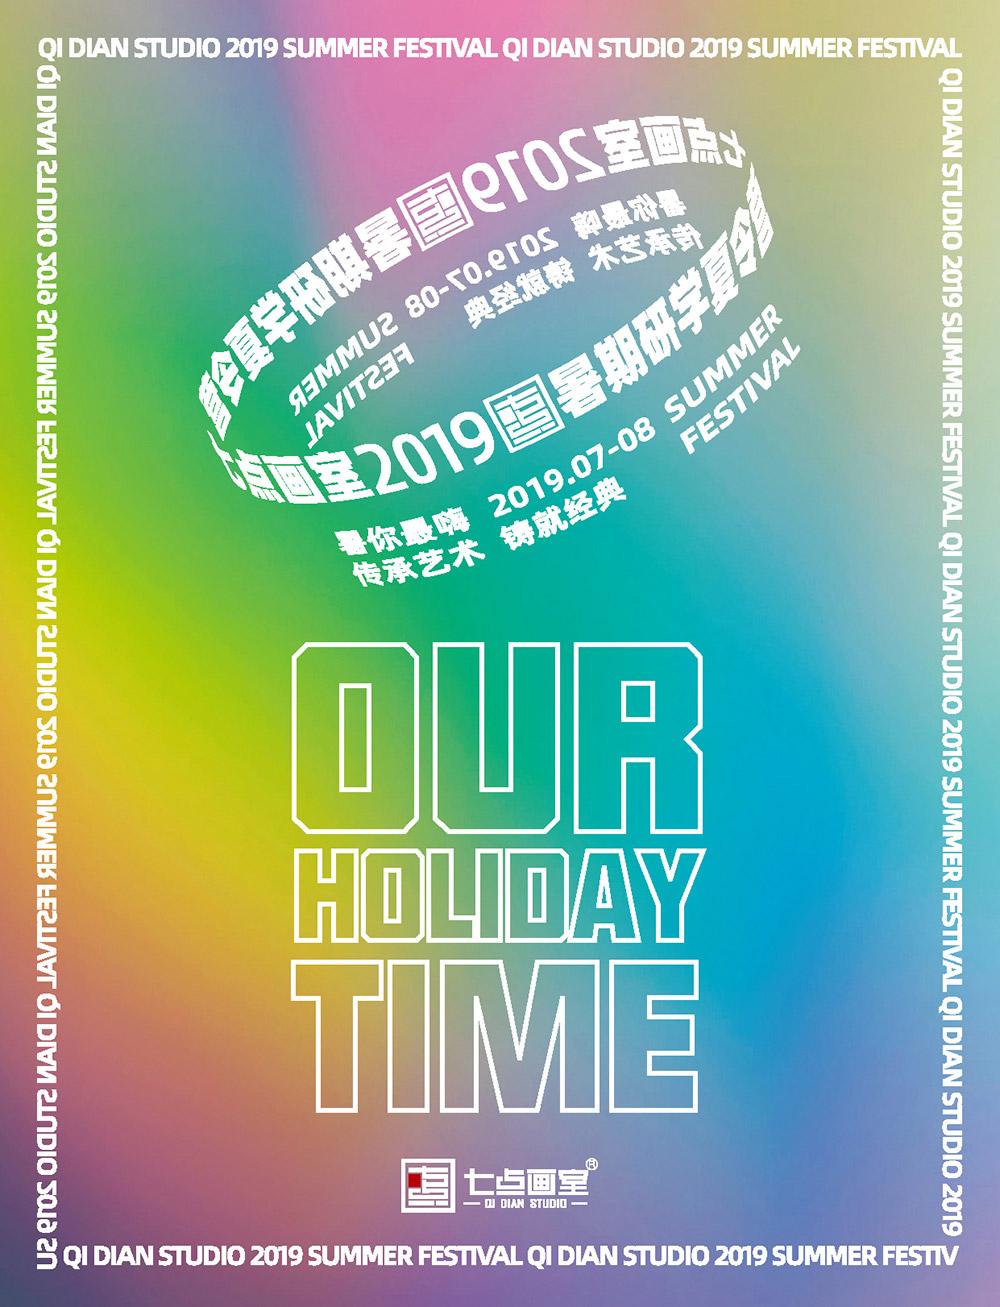 Holiday time(一):记录你在七点暑期研学夏令营的高光时刻